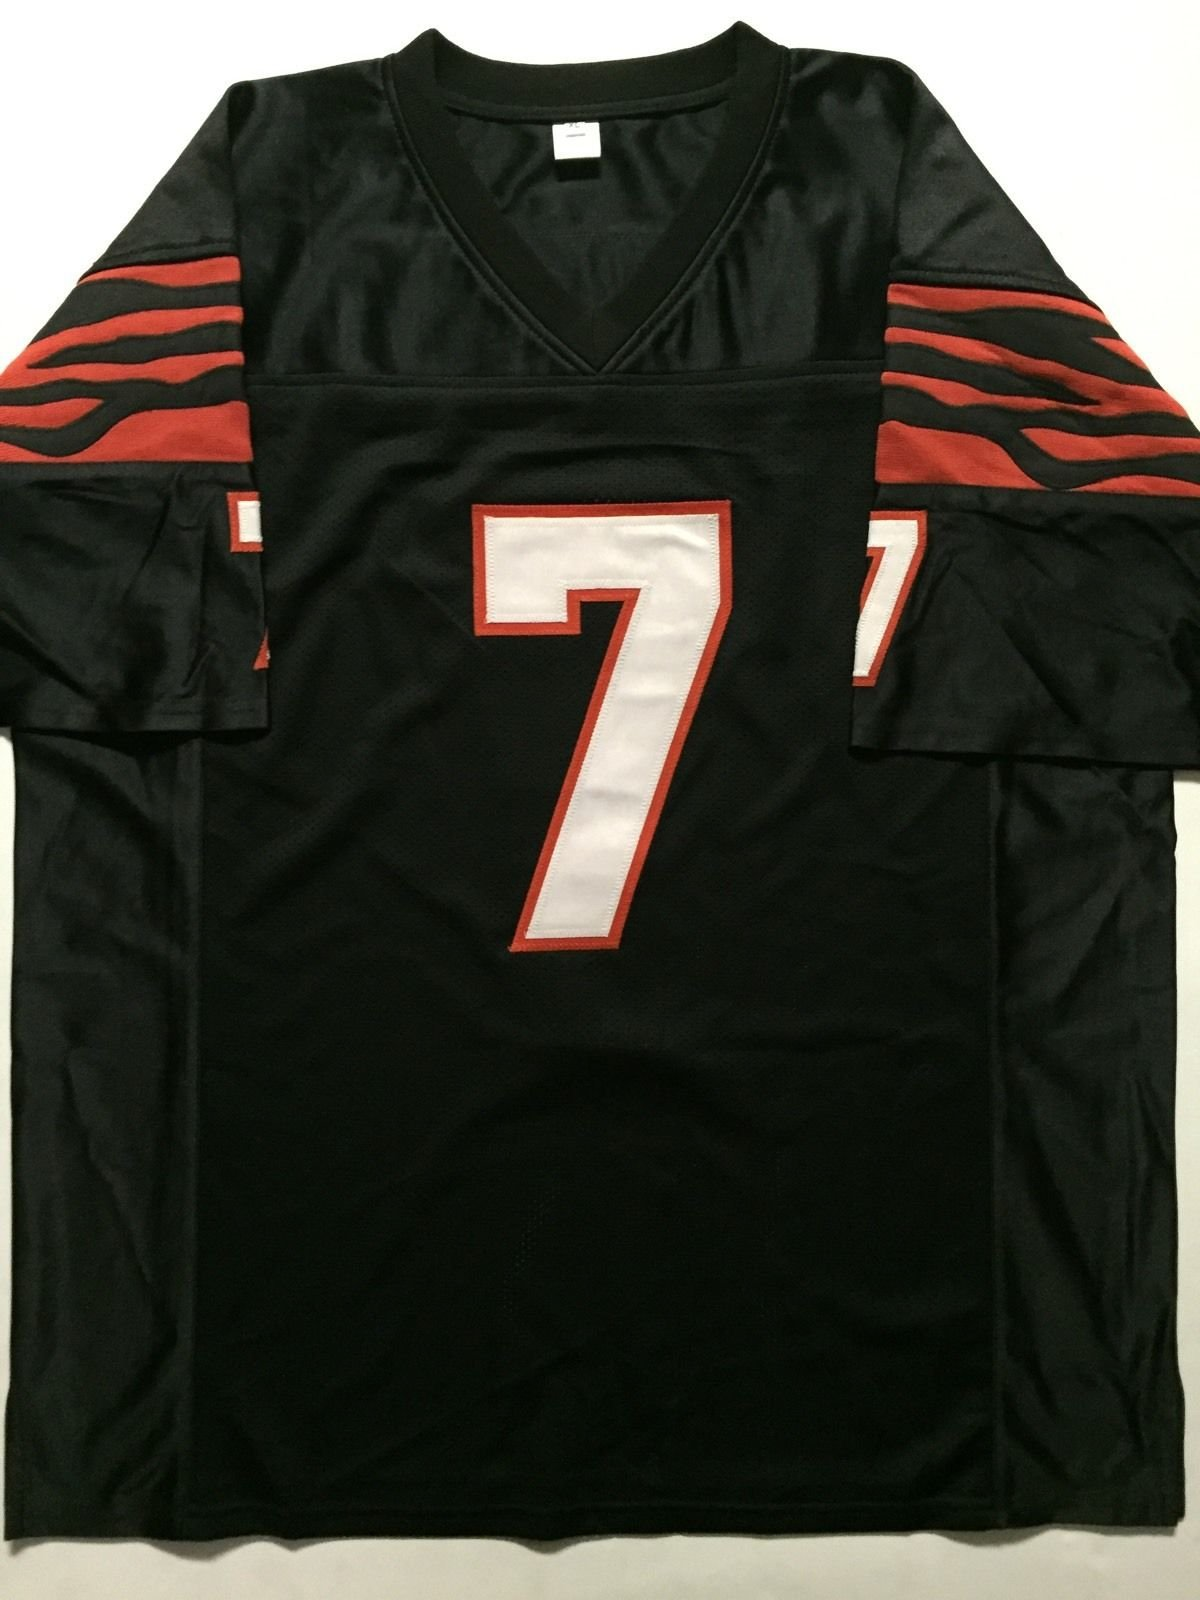 Autographed/Signed Boomer Esiason Cincinnati Black Football Jersey JSA COA